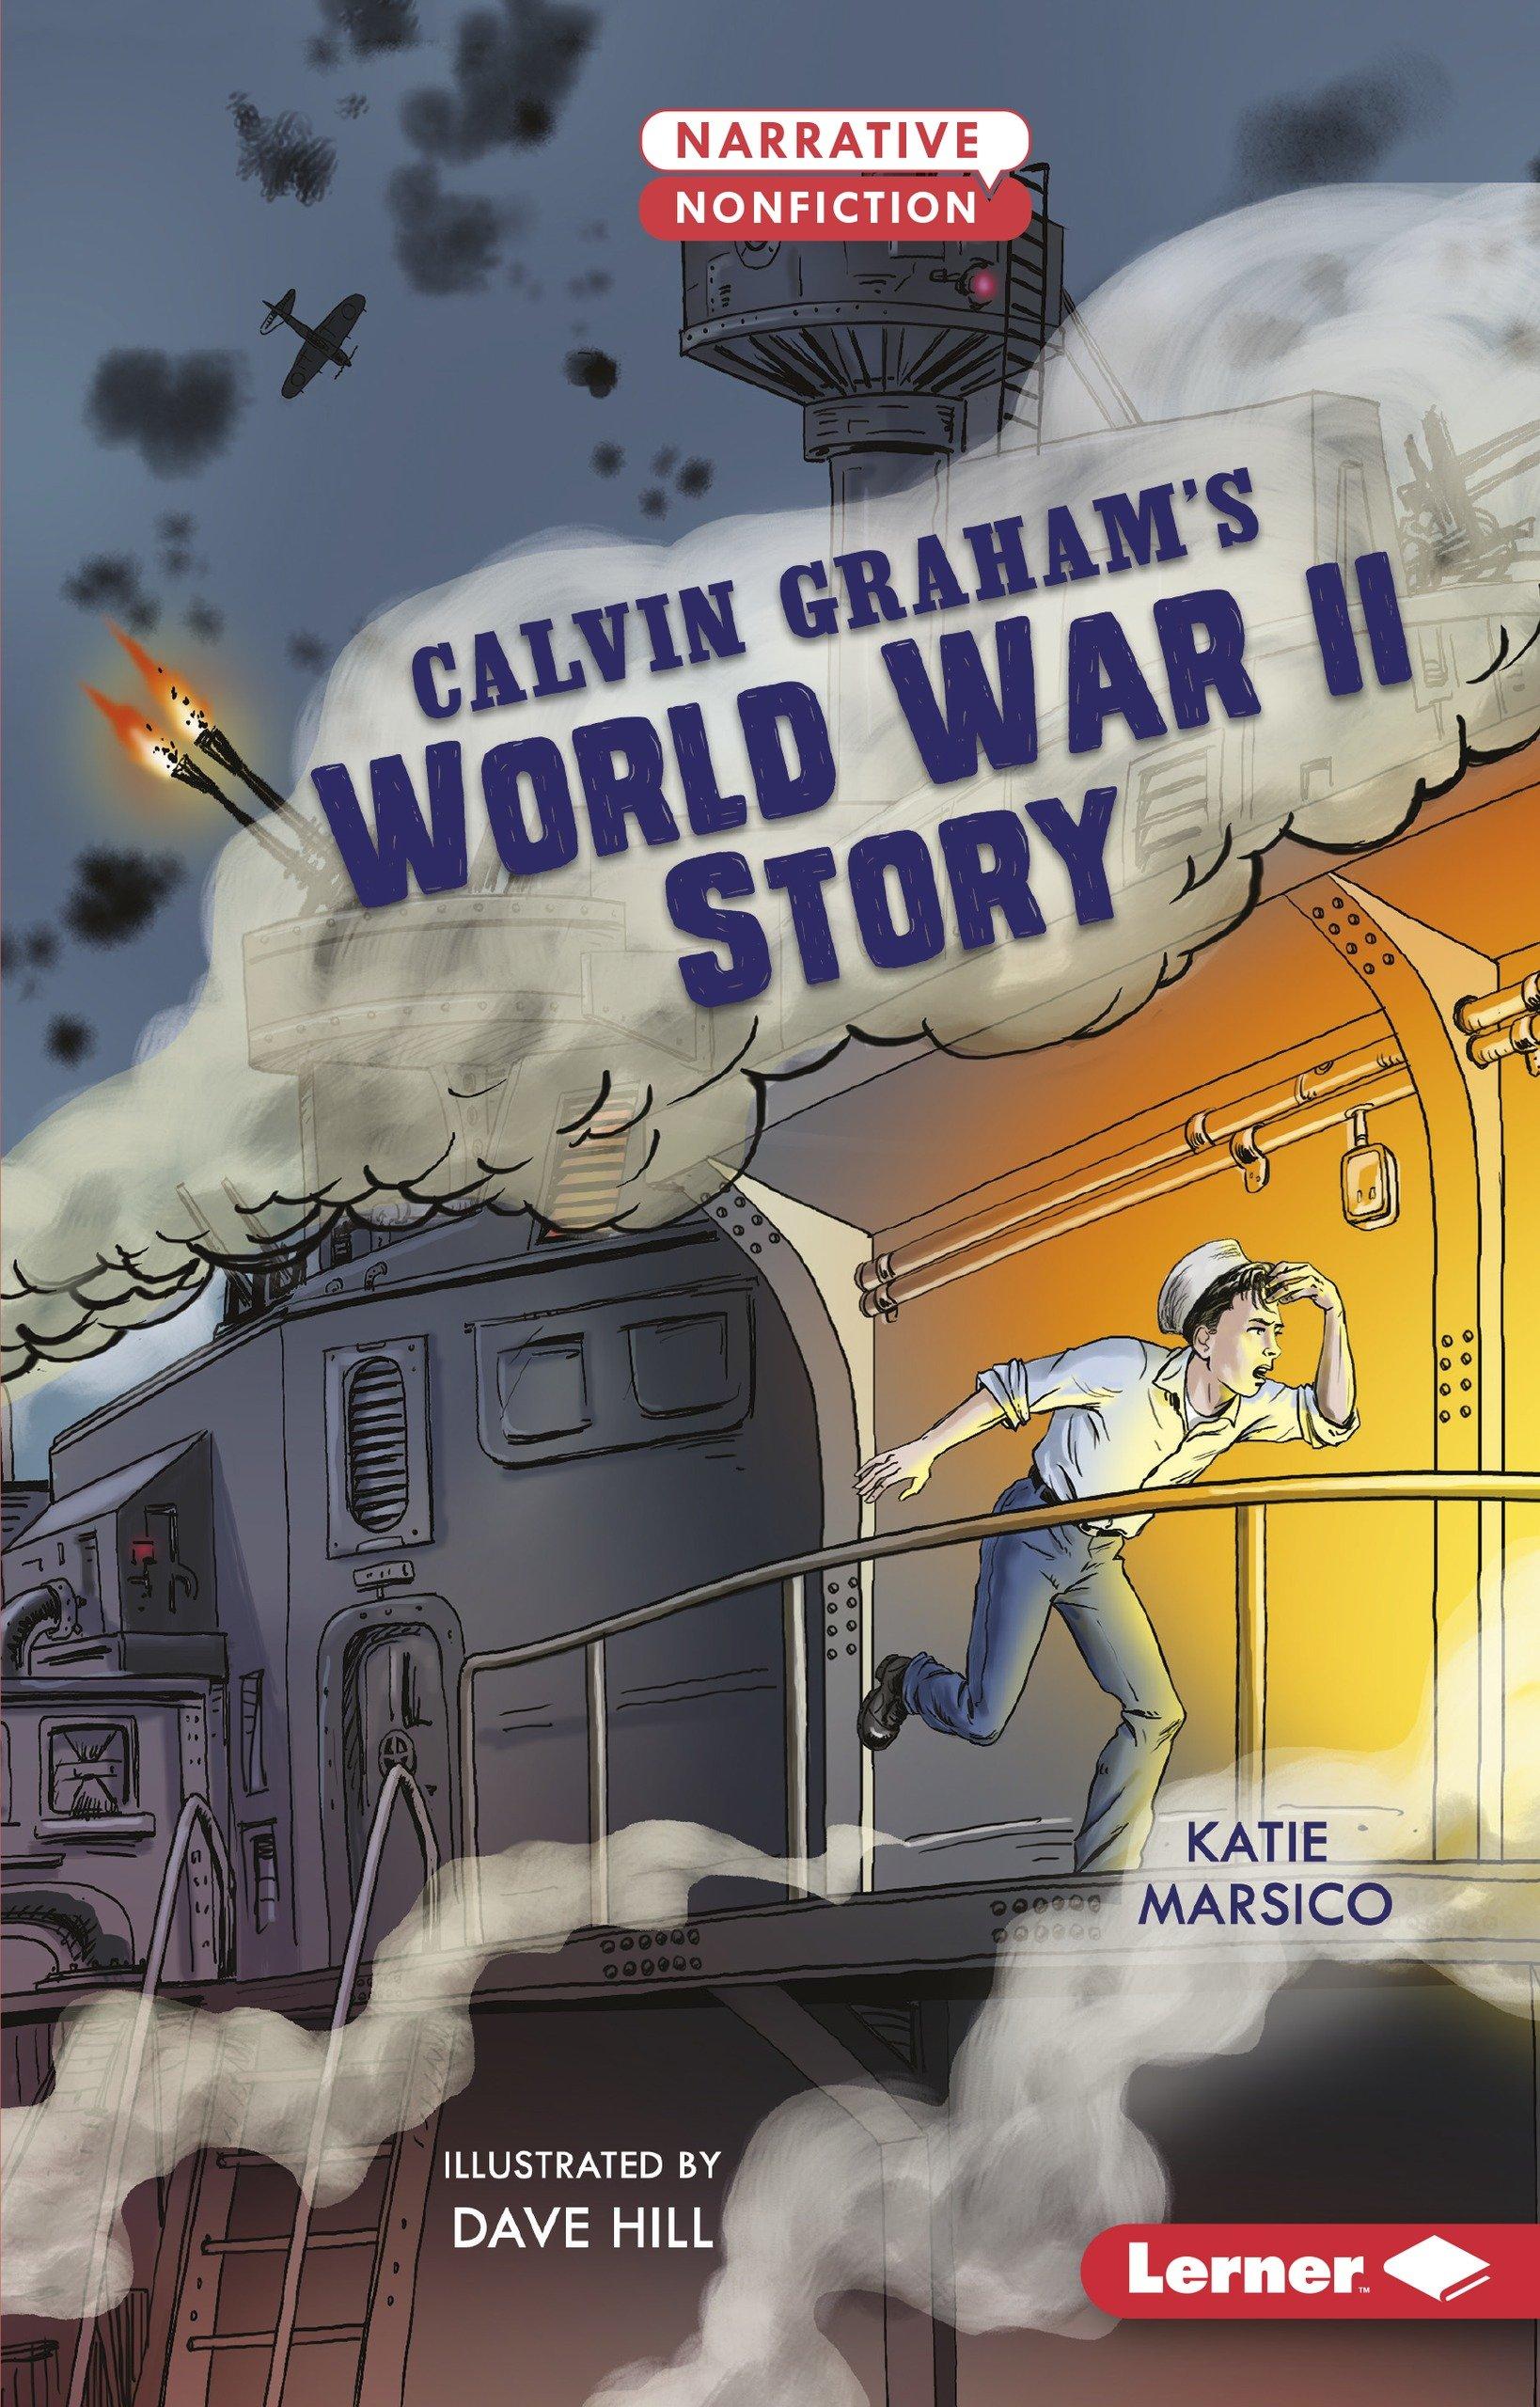 Read Online Calvin Graham's World War II Story (Narrative Nonfiction: Kids in War) PDF